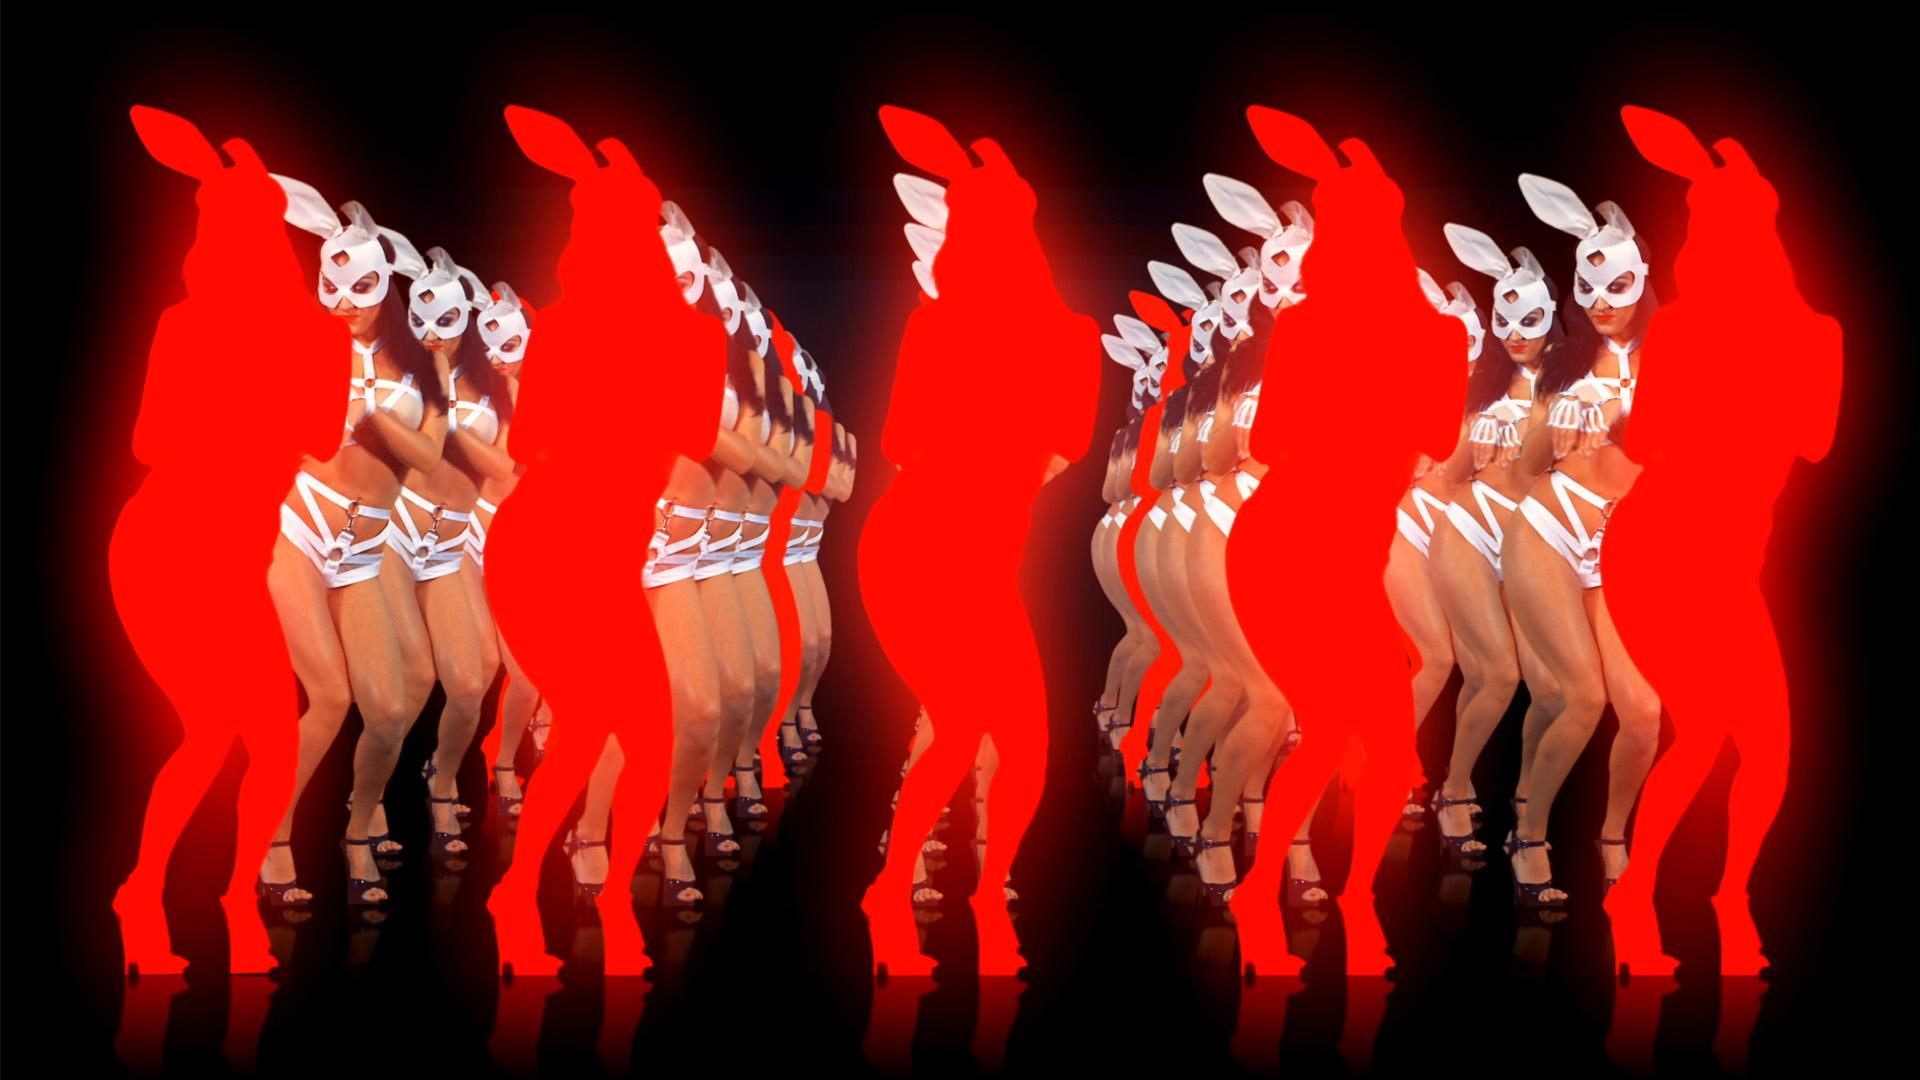 edm girl edm rabbit, dance vj loops